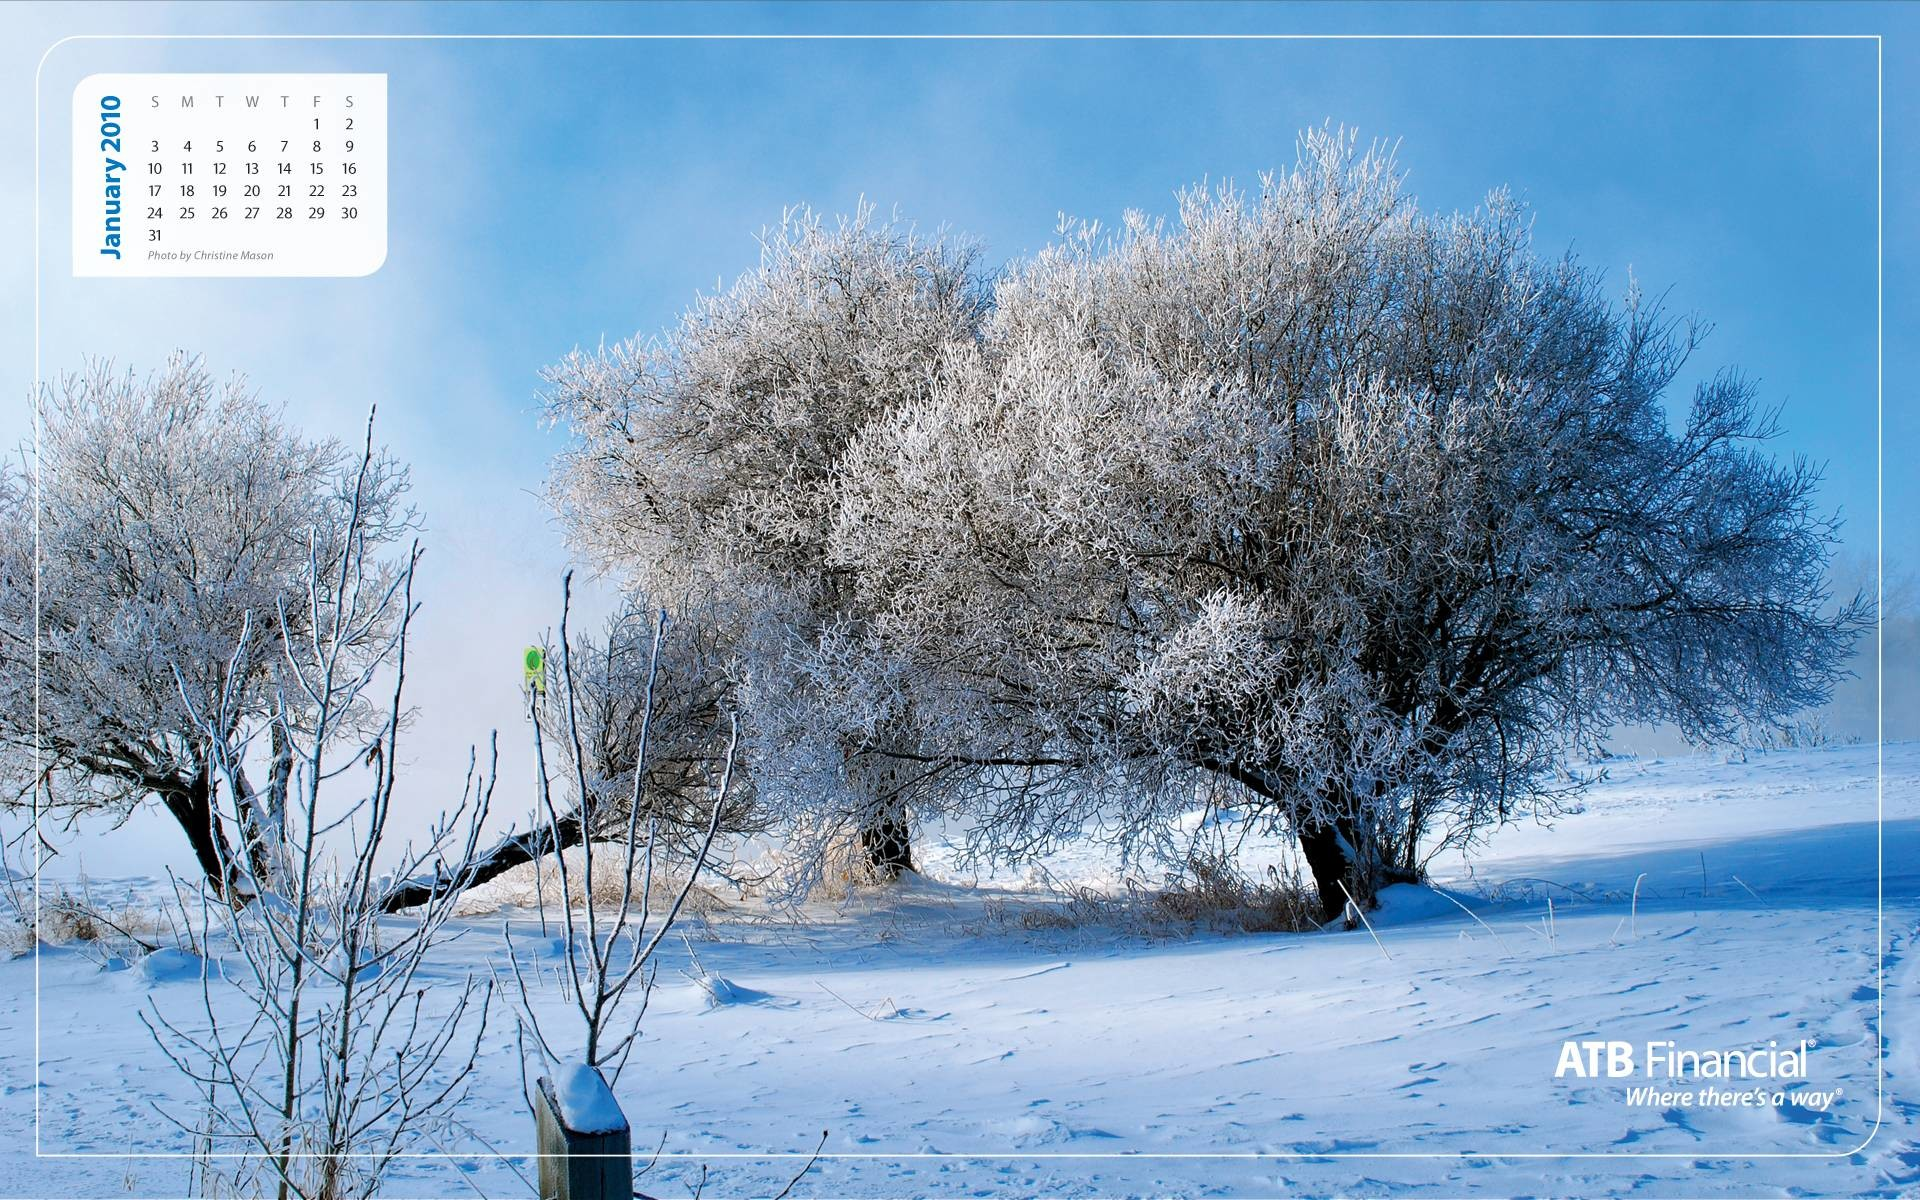 January Calendar Wallpaper Hd : January desktop wallpaper images